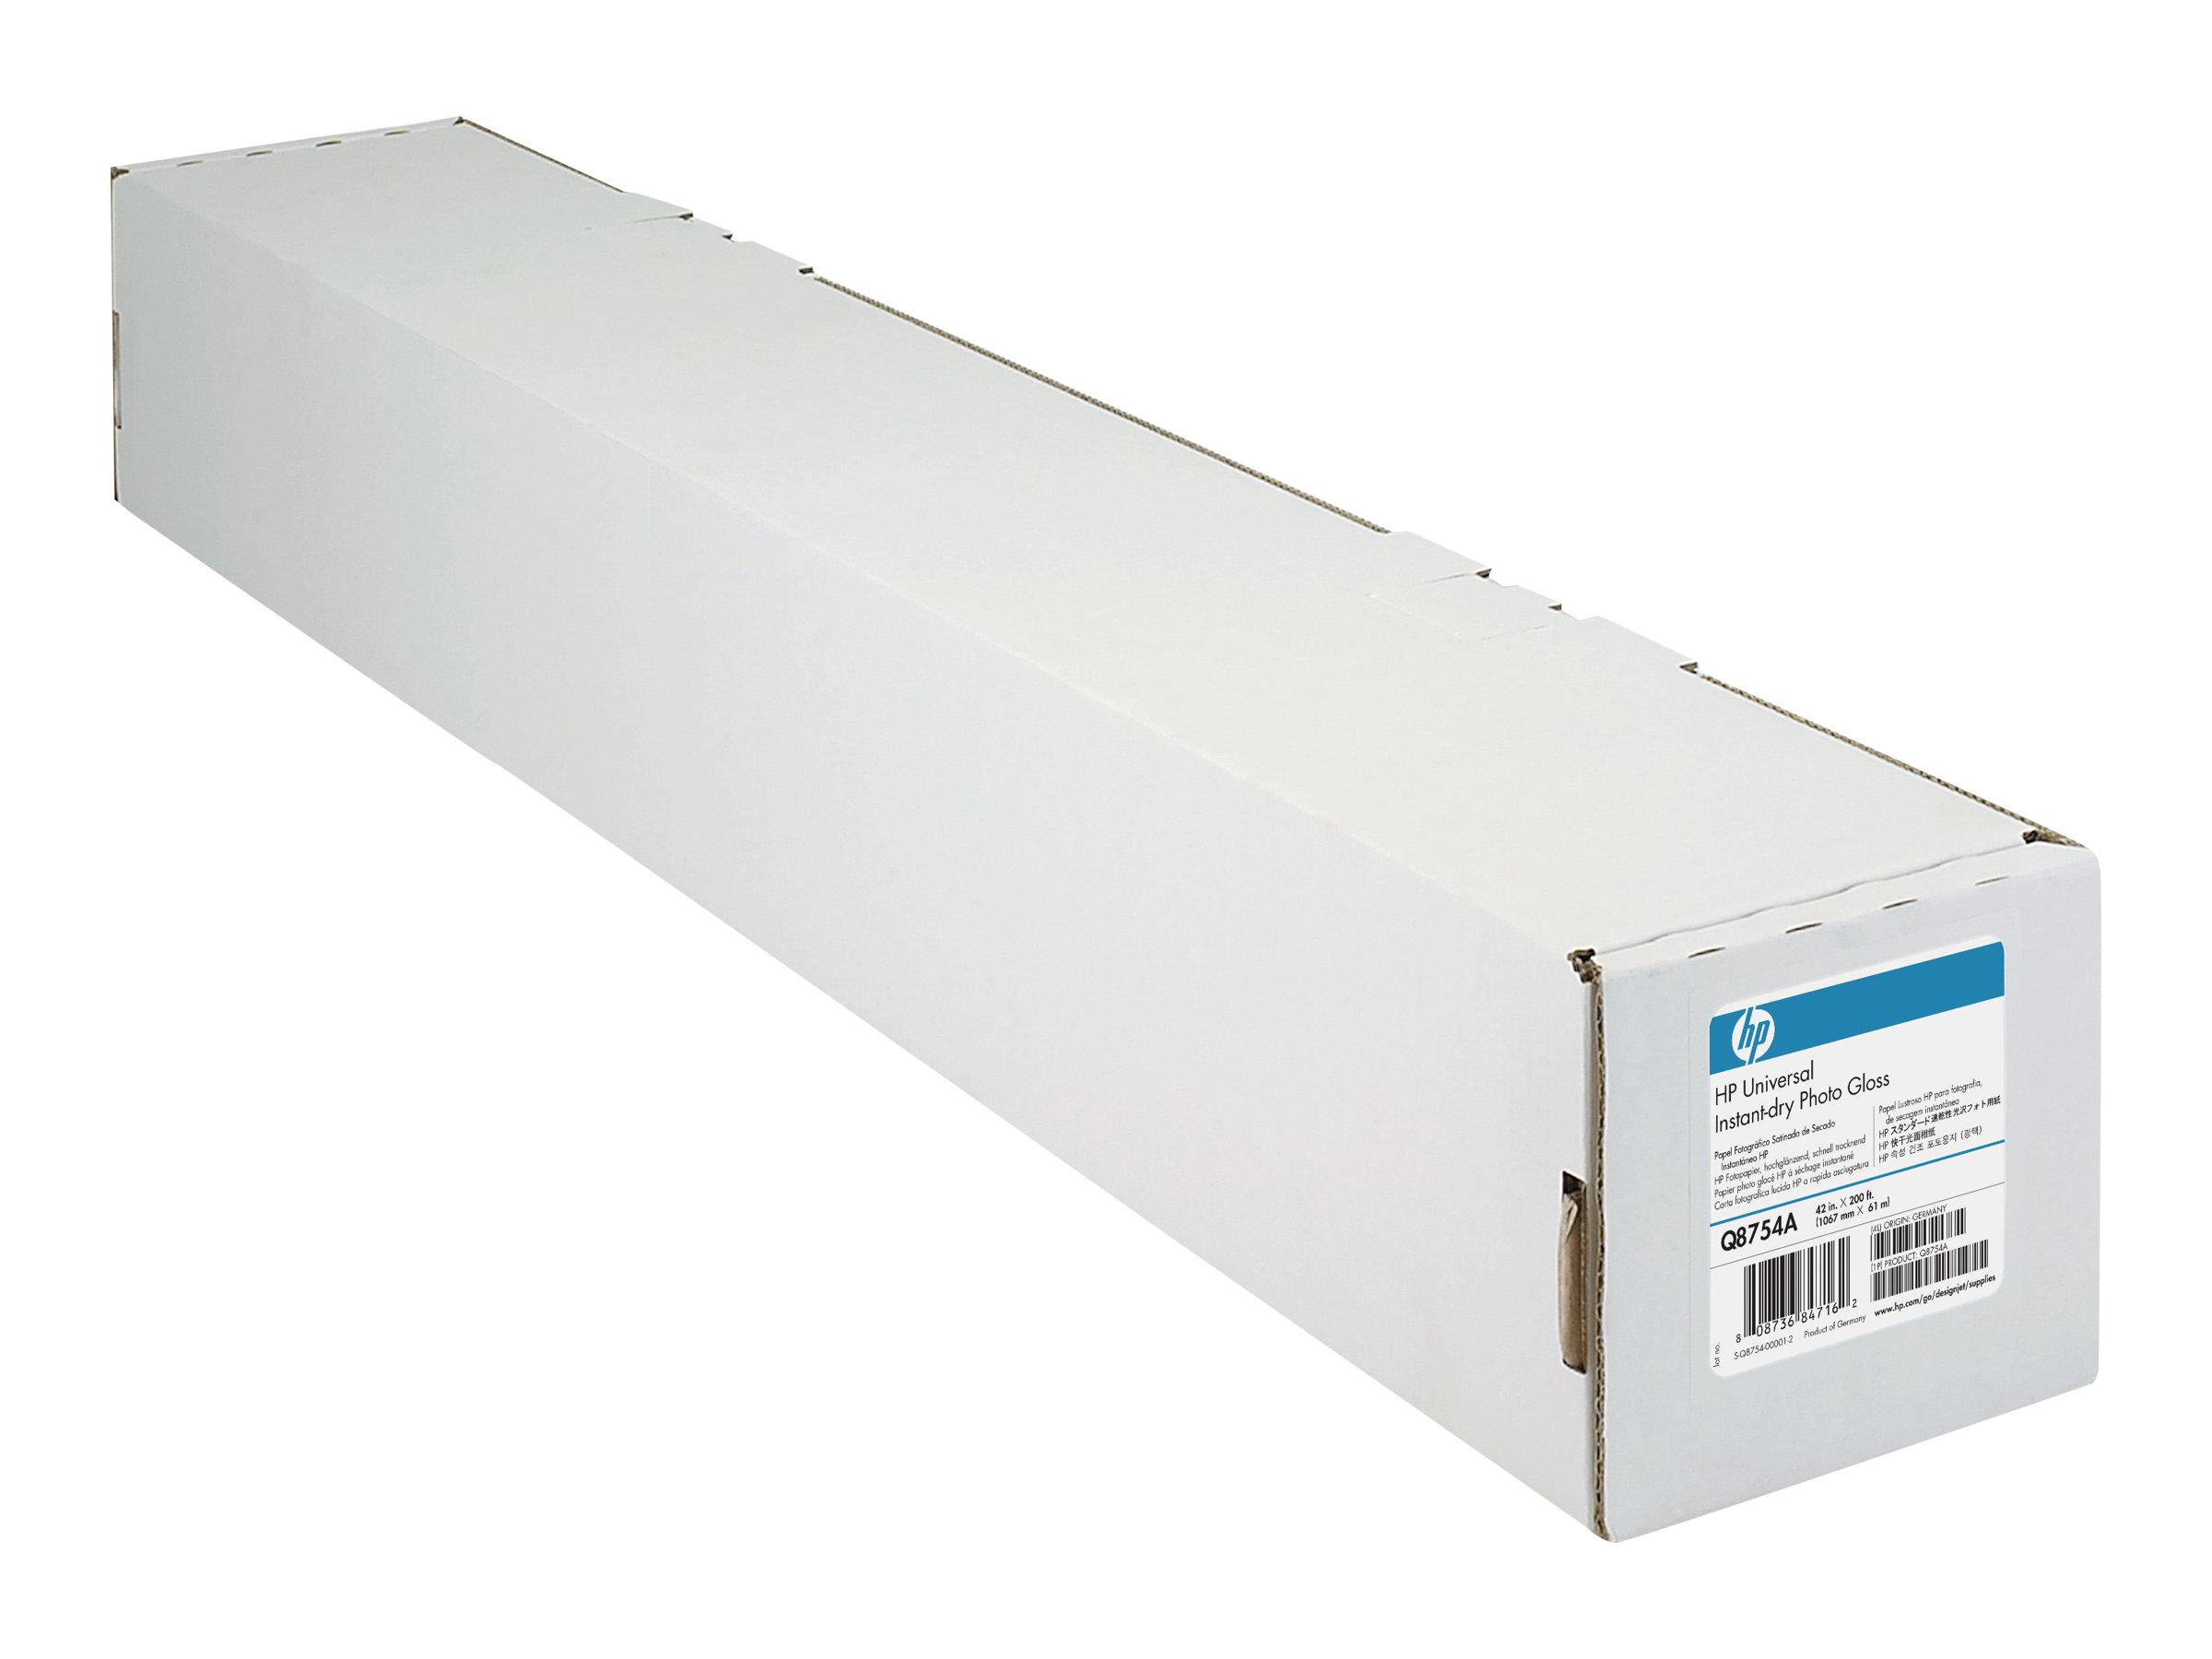 HP Universal Instant-Dry Photo Gloss - Glänzend - 7,4 mil - Rolle (106,7 cm x 61 m) - 190 g/m² - 1 Rolle(n) Fotopapier